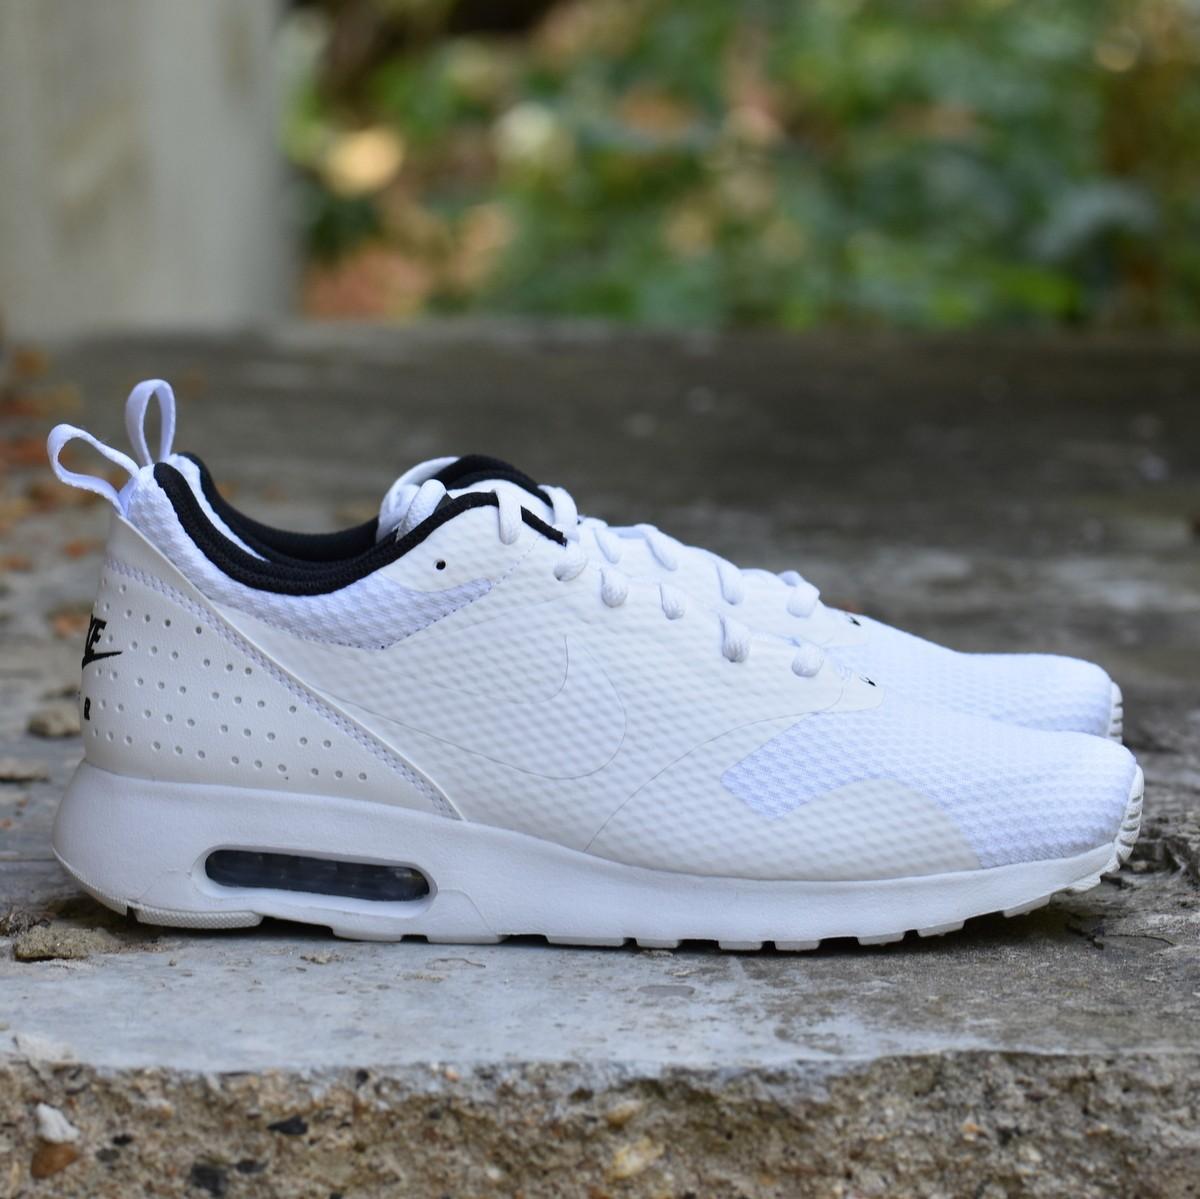 cb1c4c49e52 Nike AIR MAX TAVAS Pánské boty EU 42 705149-105